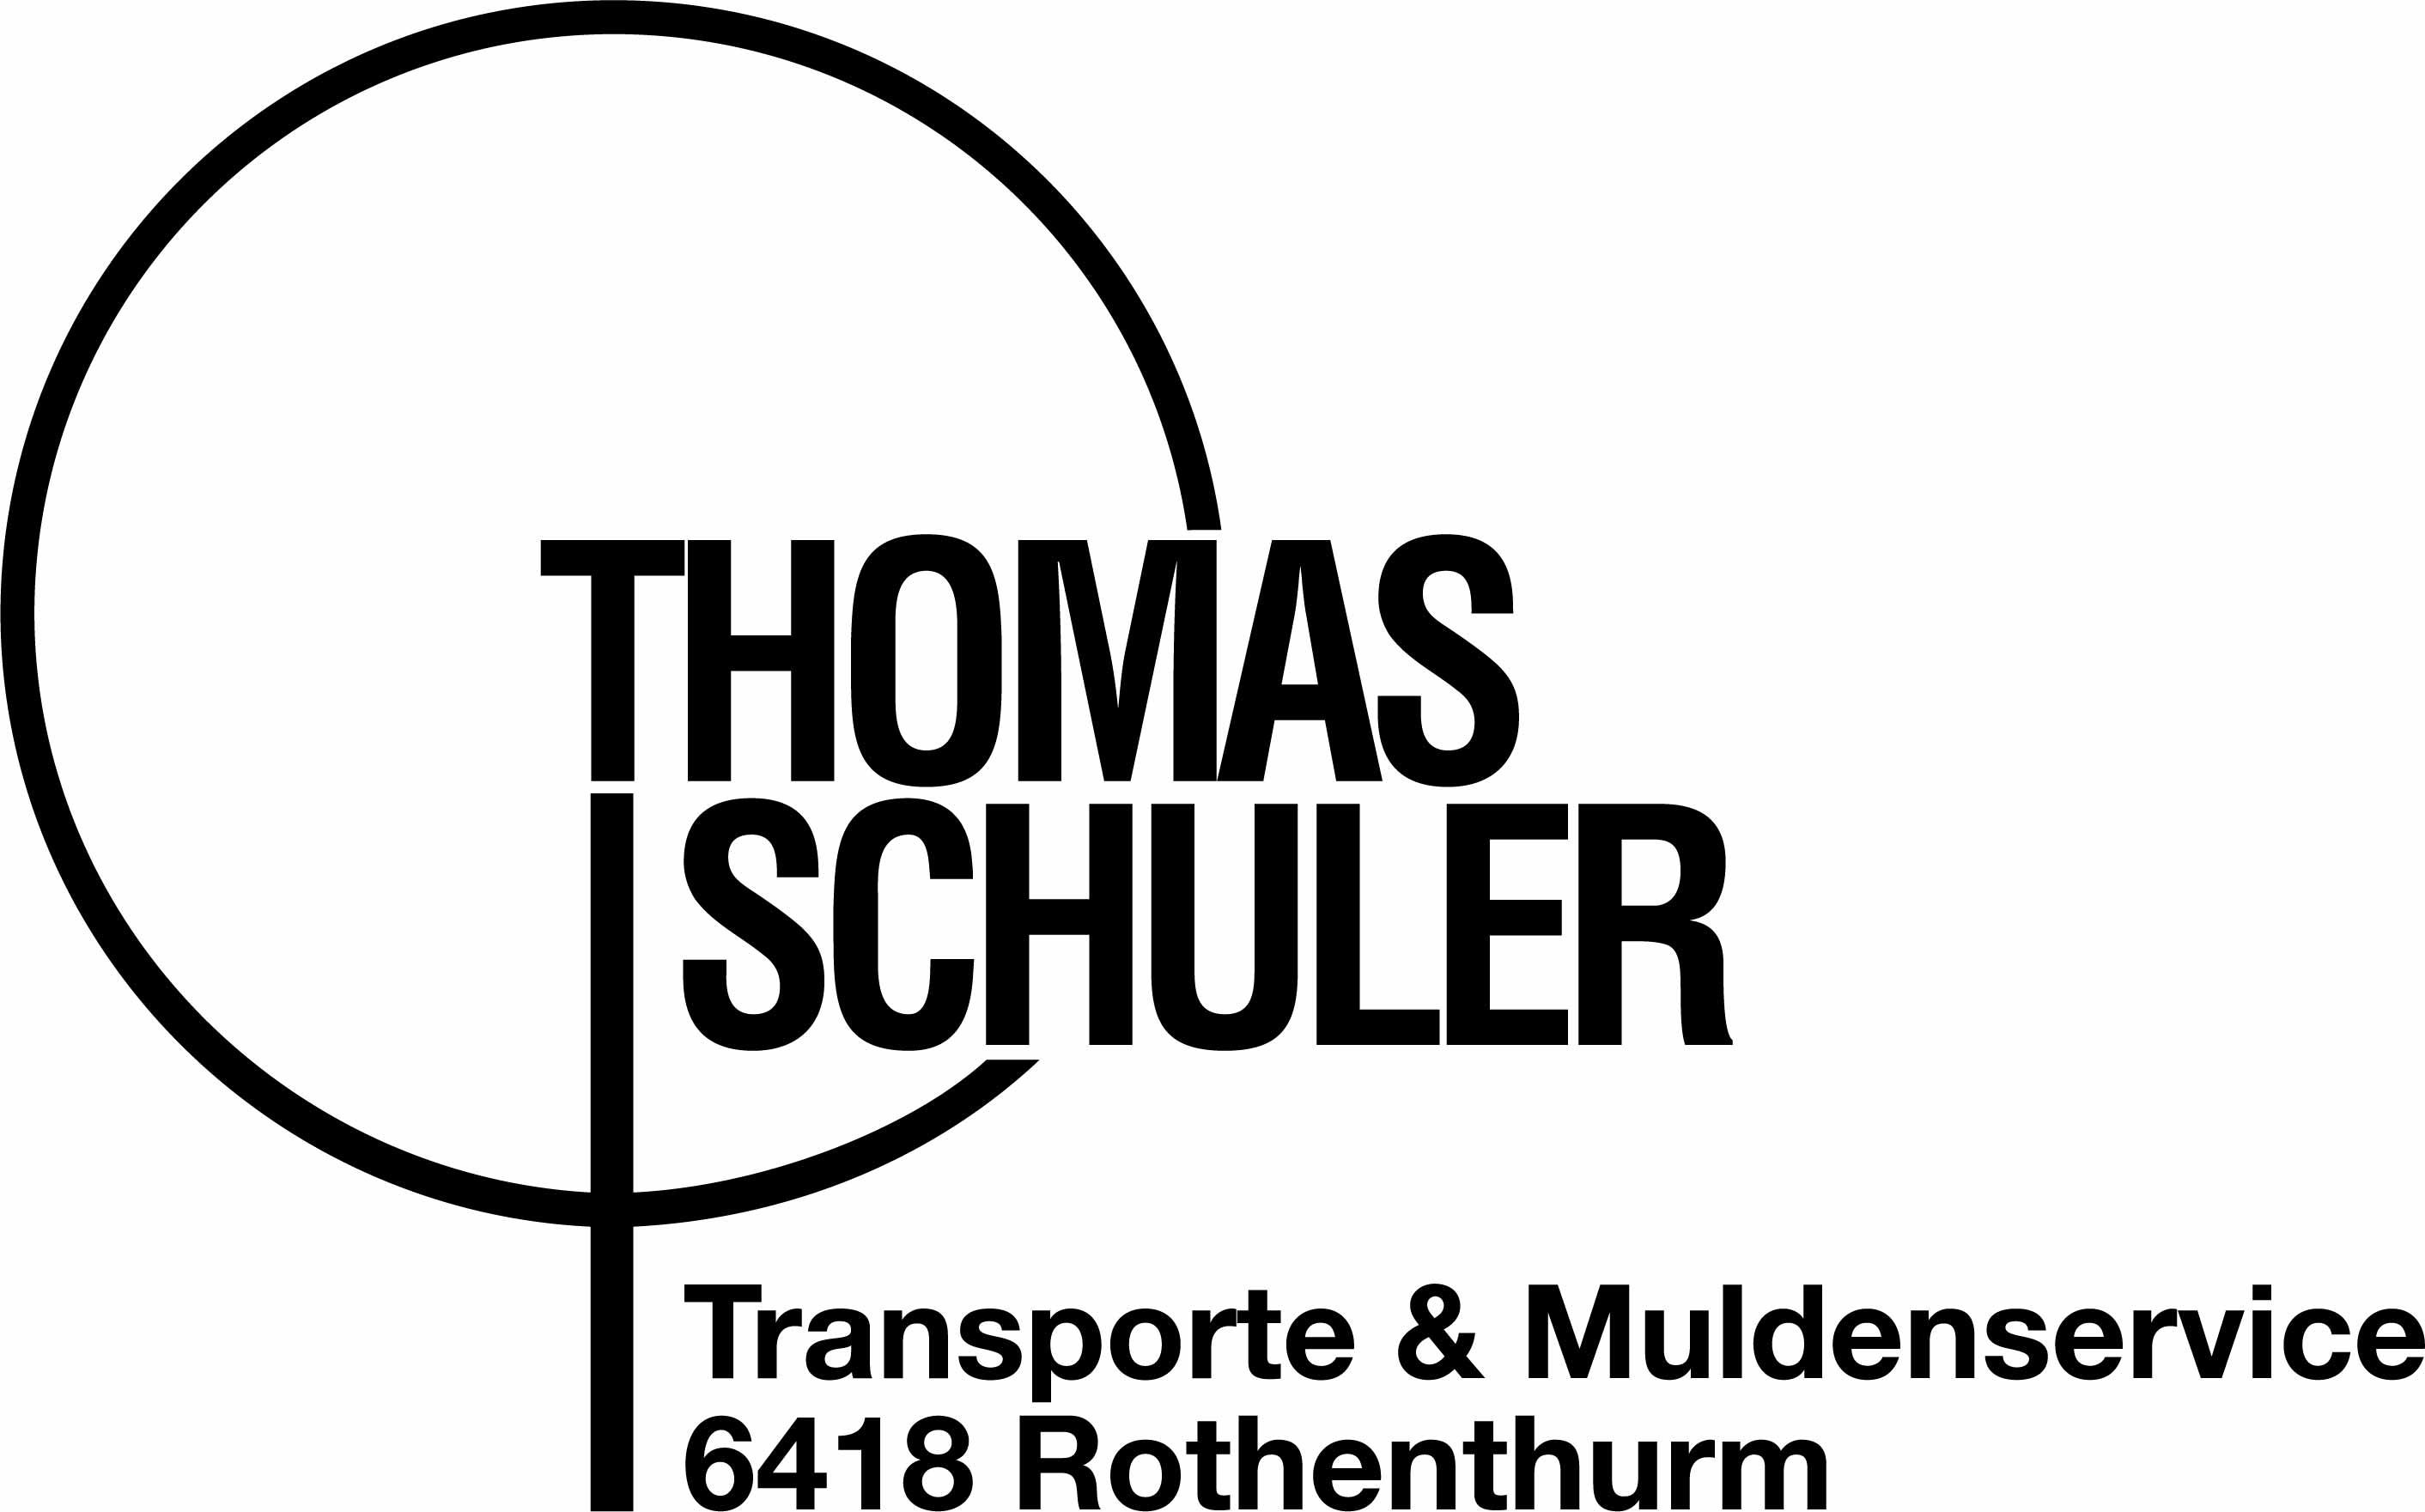 Thomas Schuler Transport